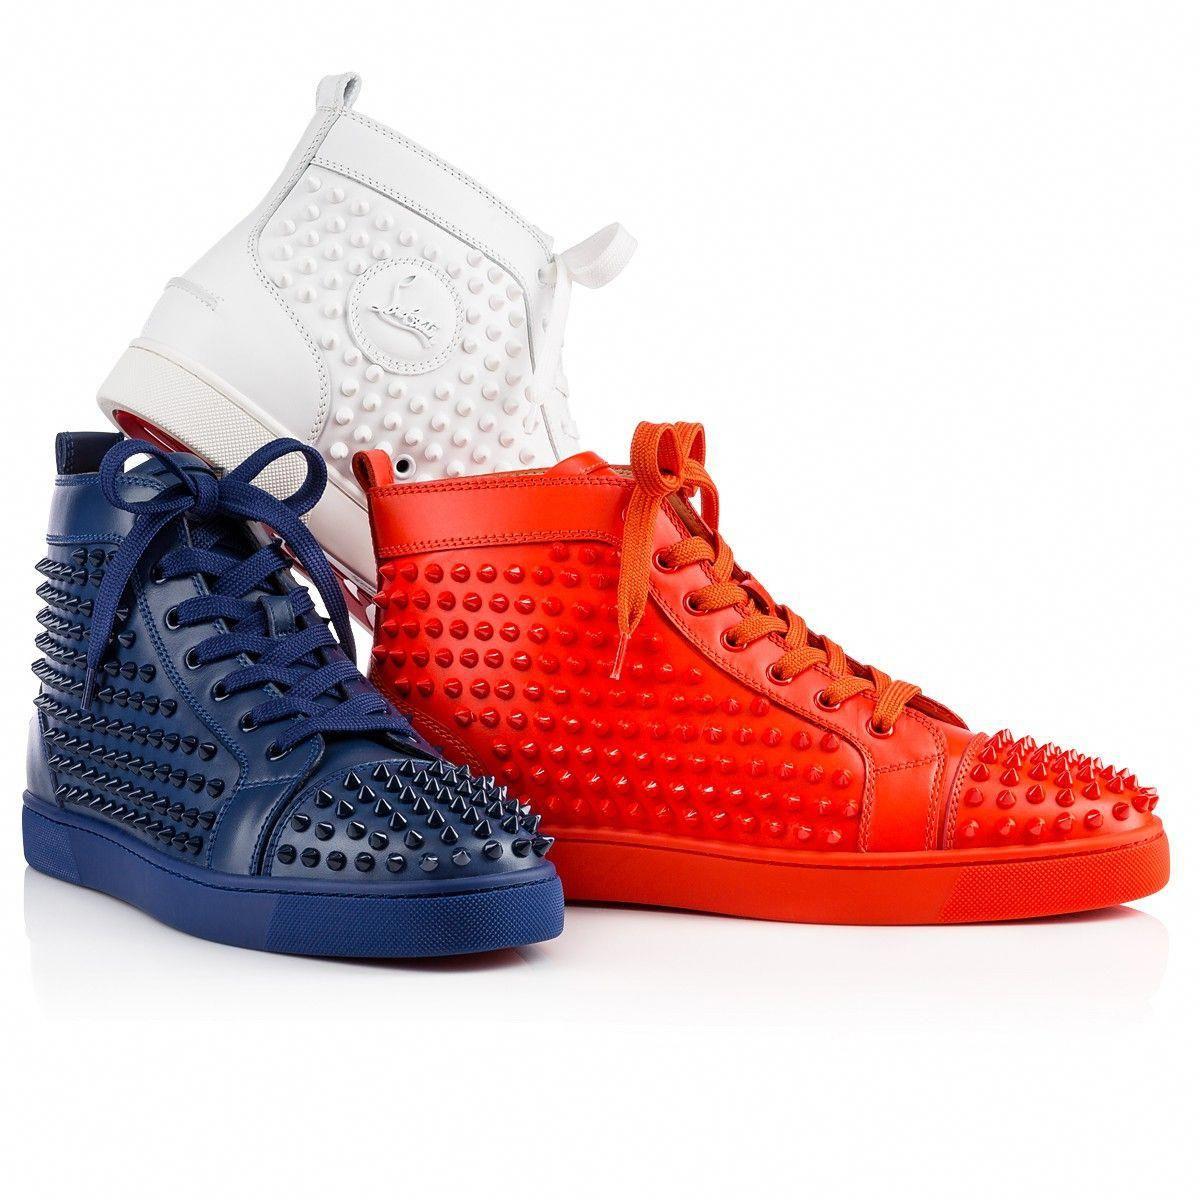 461cf5a719c4 Shoes - Louis Spikes Men s Flat - Christian Louboutin  ChristianLouboutin